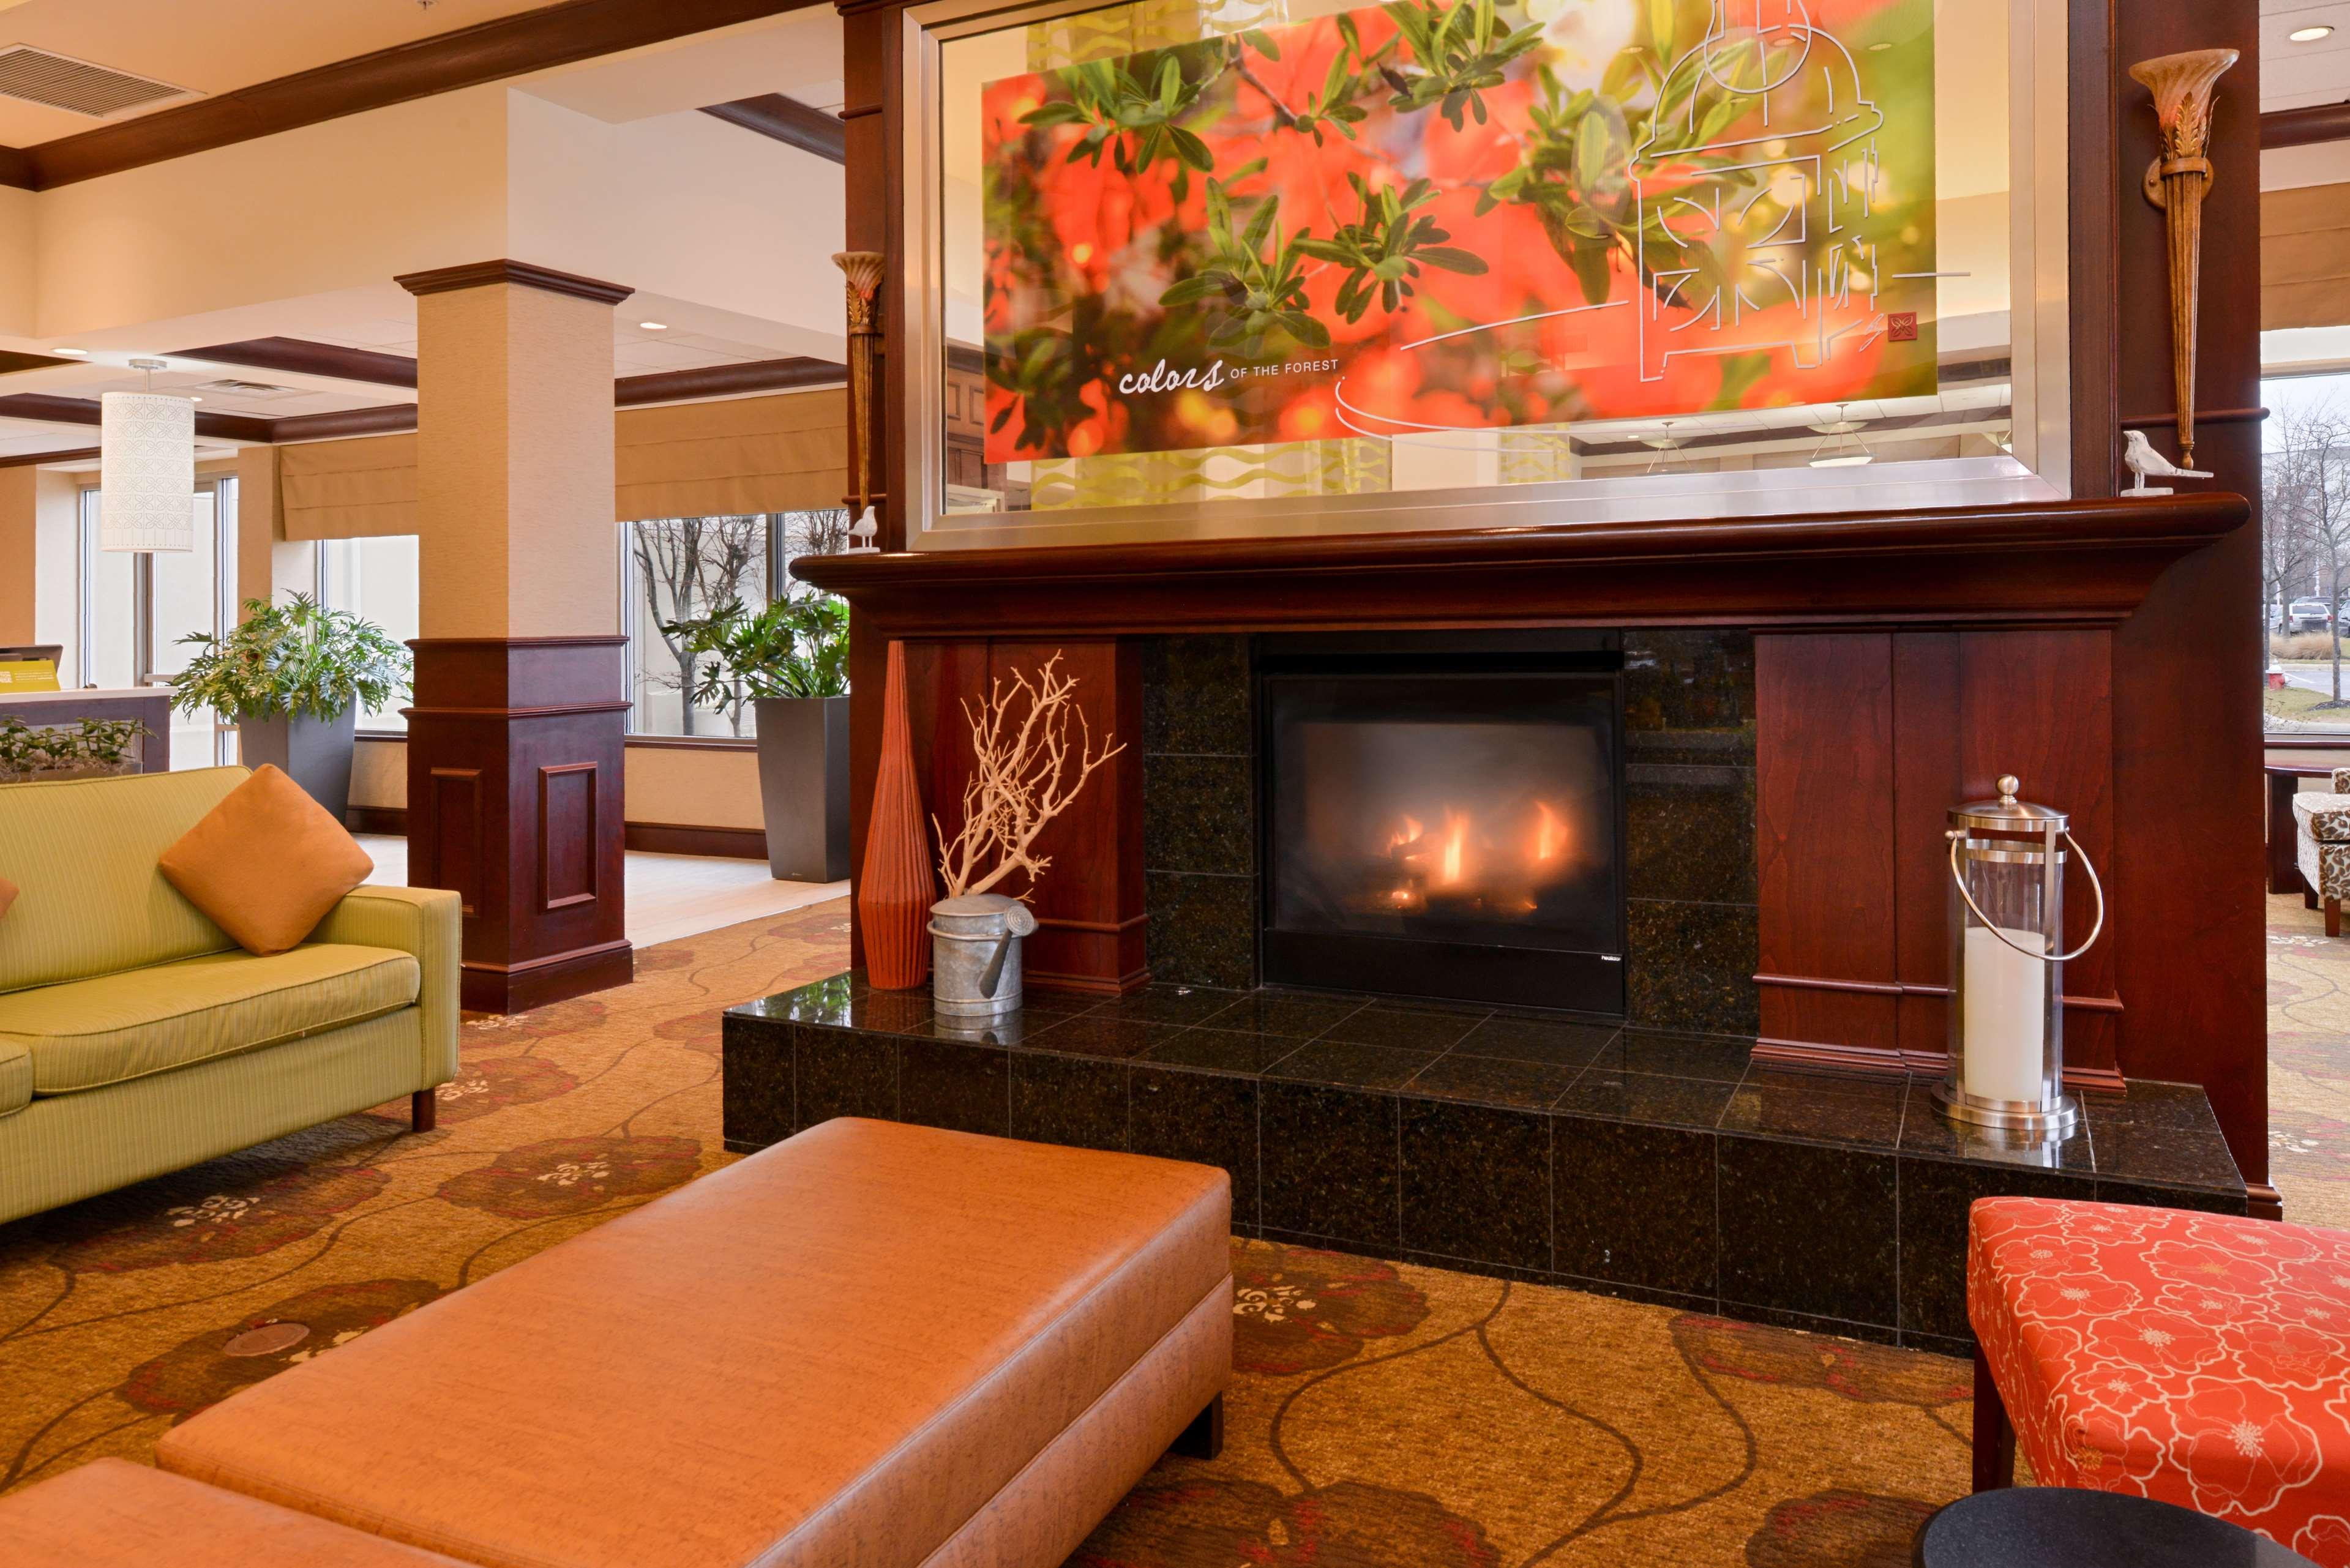 Hilton Garden Inn Columbus/Polaris image 6